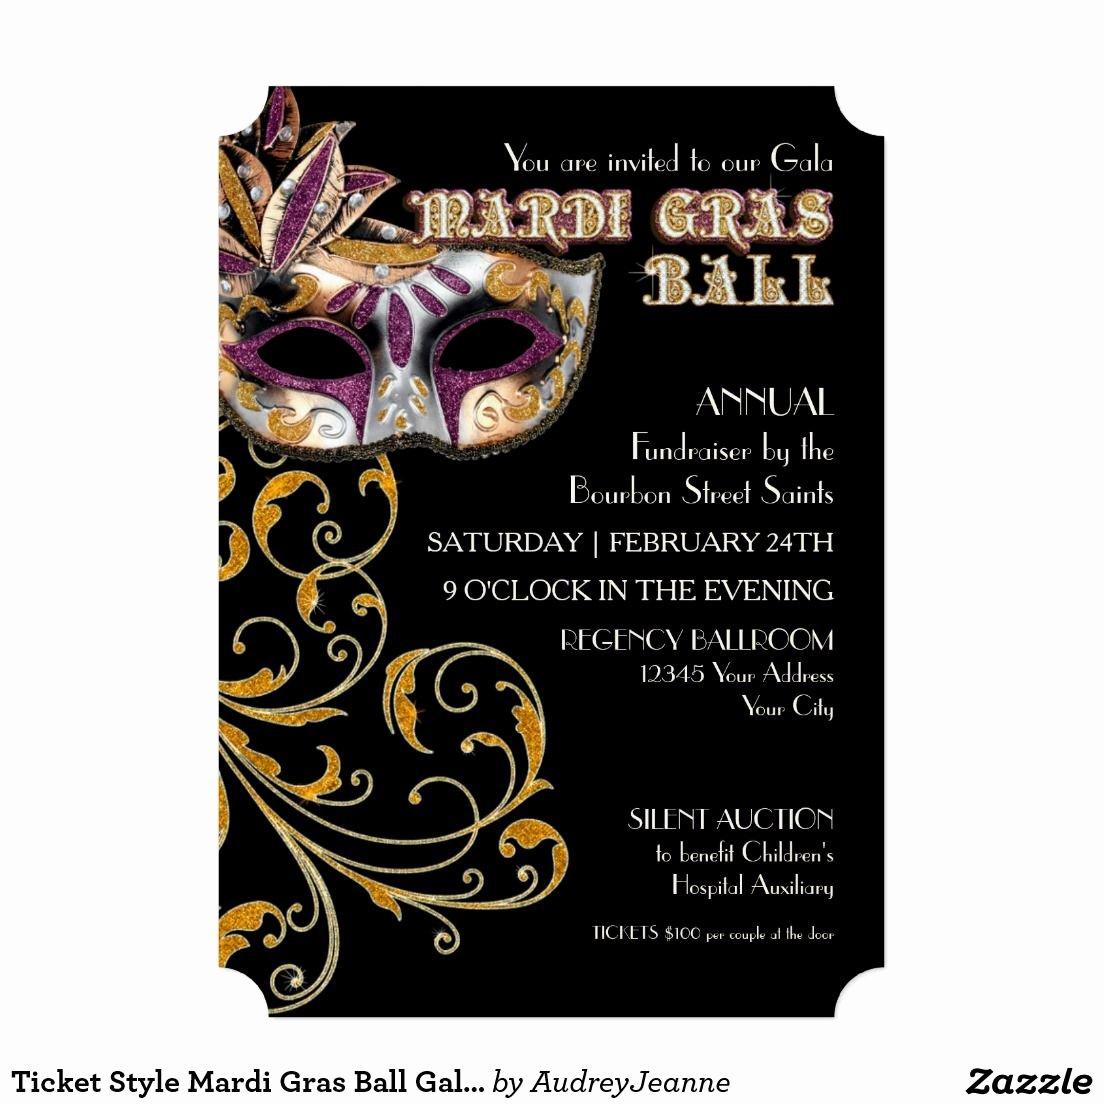 Mardi Gras Invitation Template Free Luxury Ticket Style Mardi Gras Ball Gala Party Fundraiser